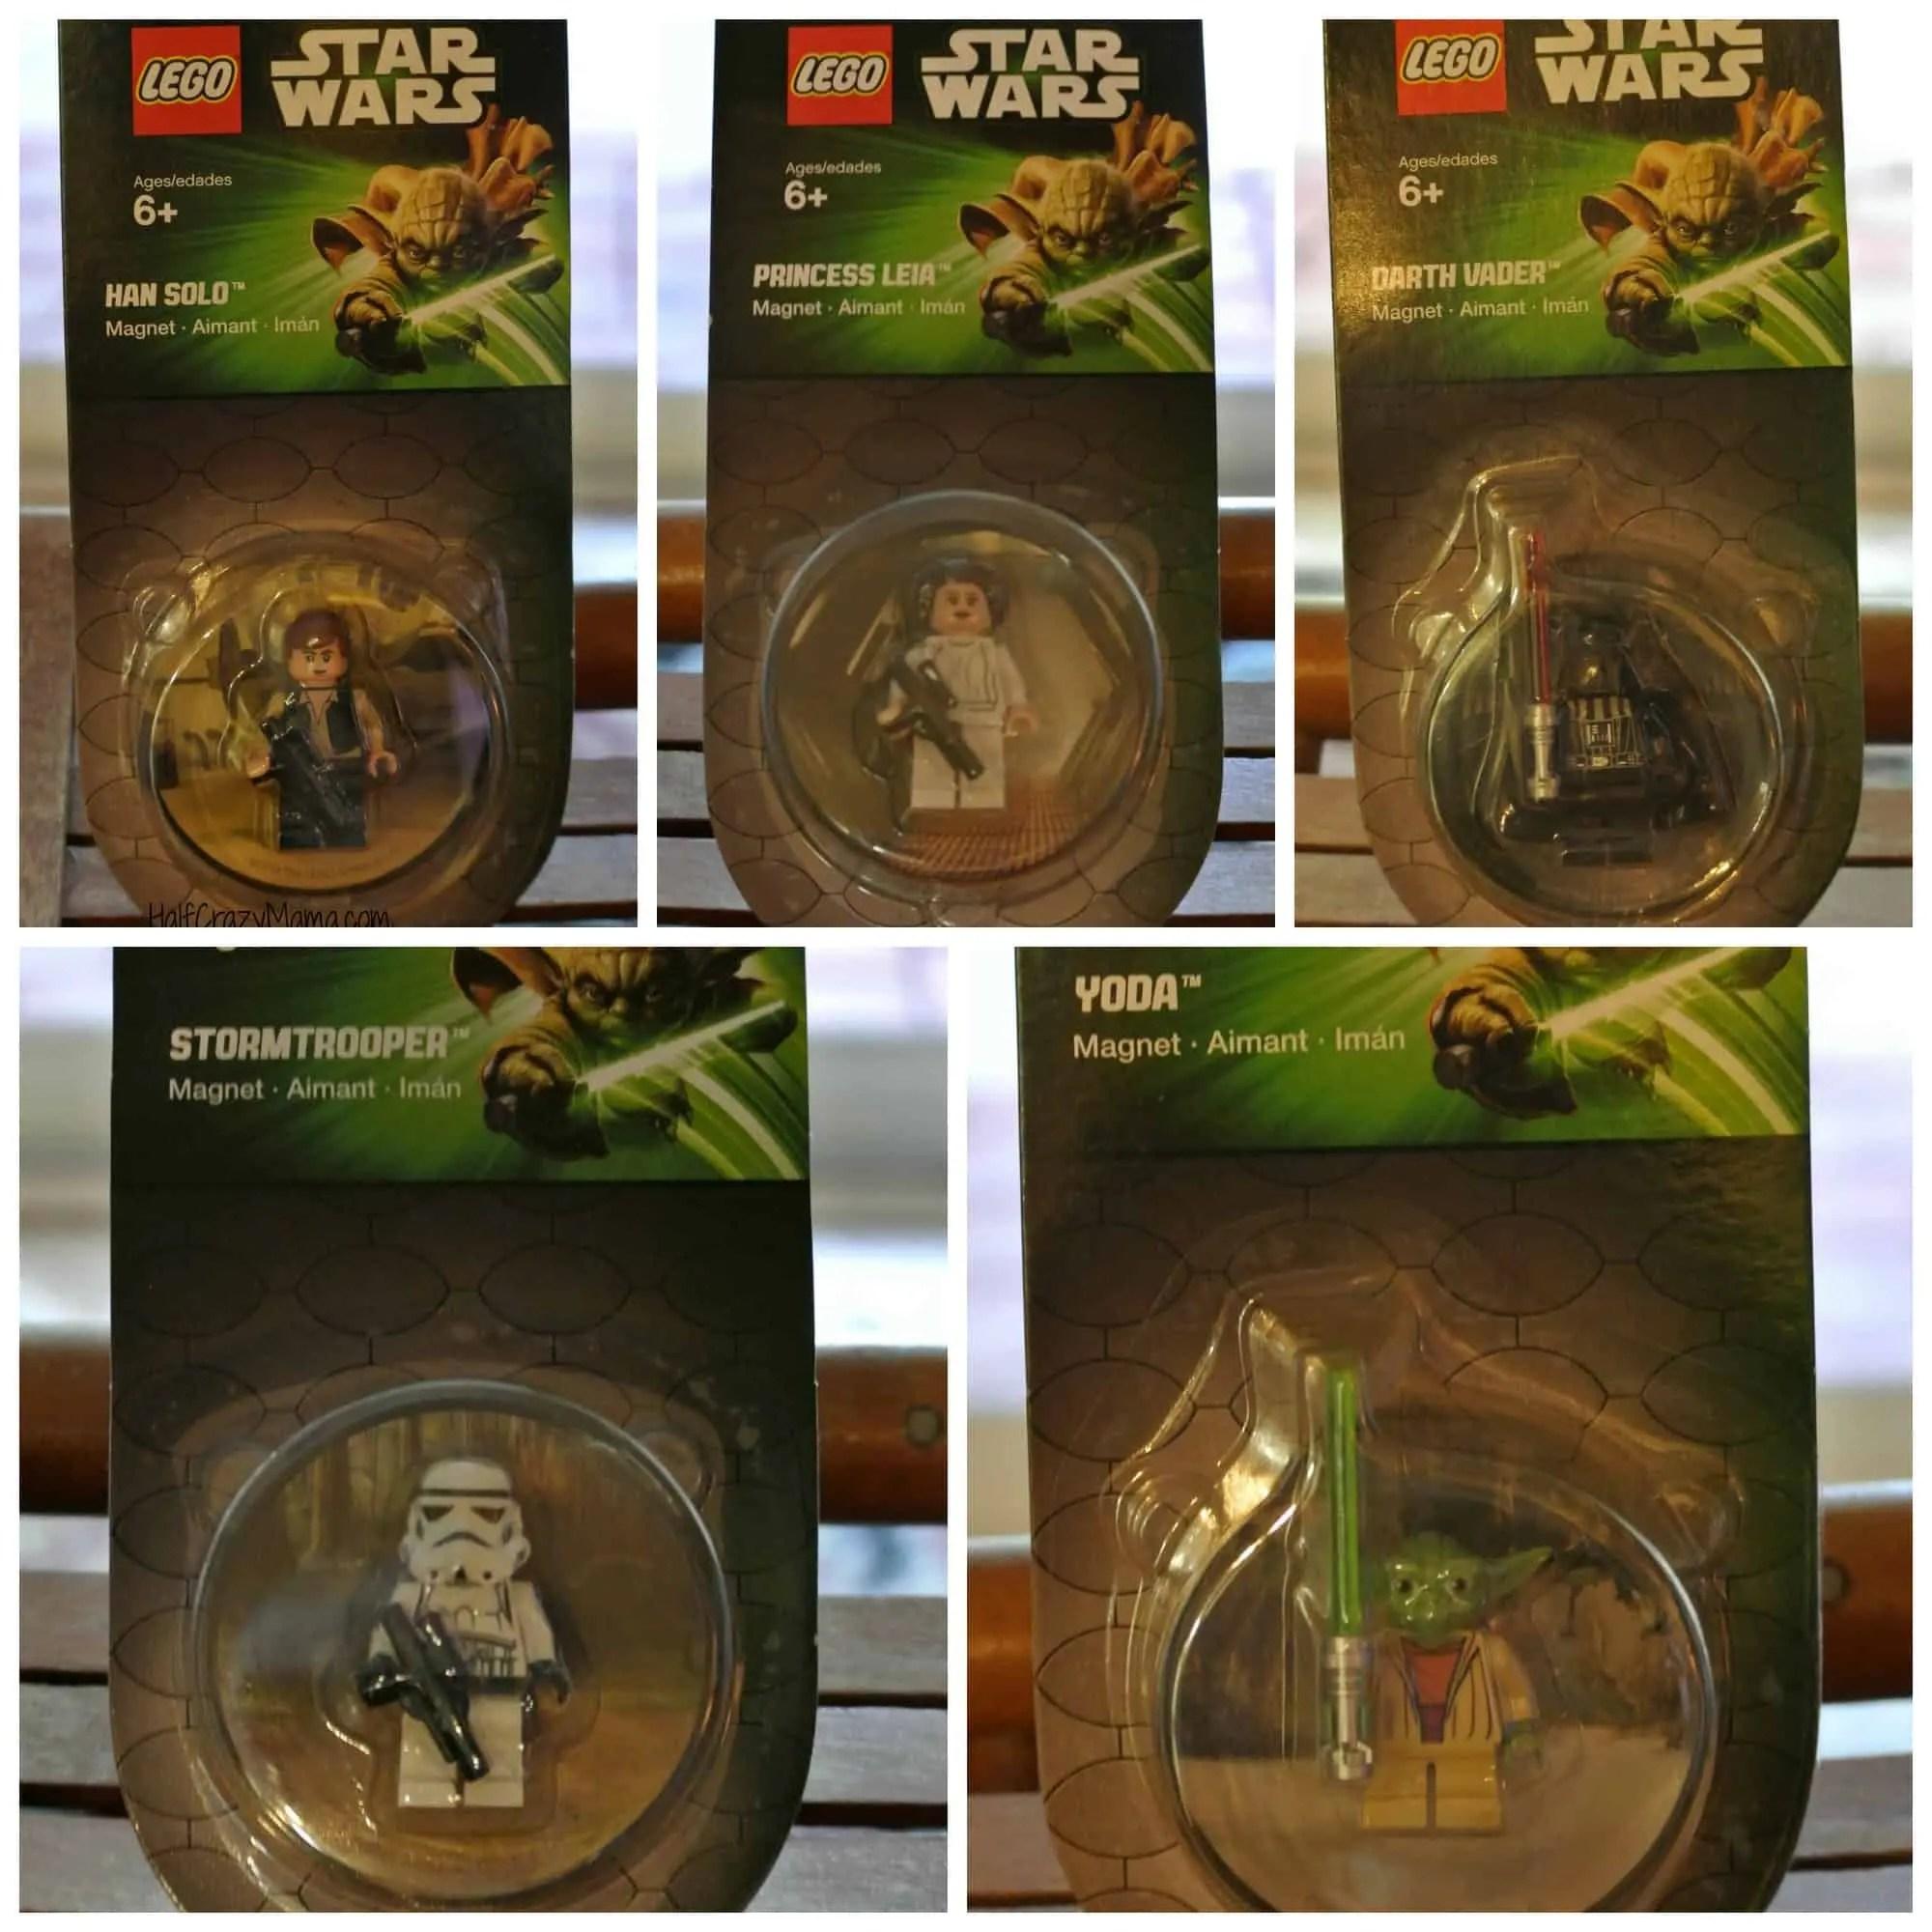 Star Wars Lego Collage